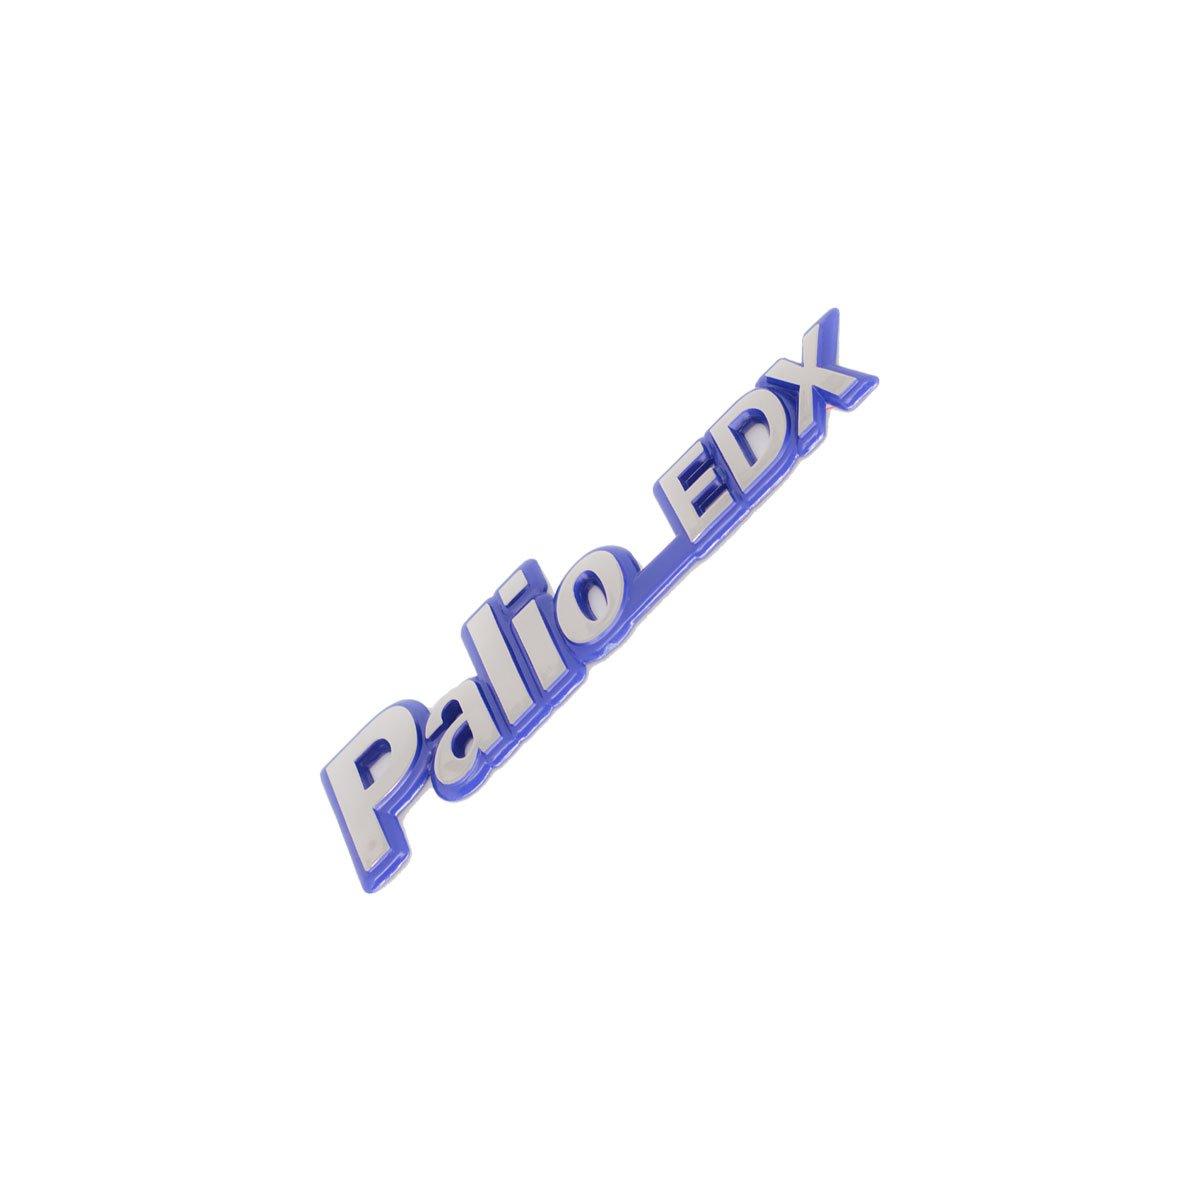 Emblema Palio EDX 97 Cromado/Azul